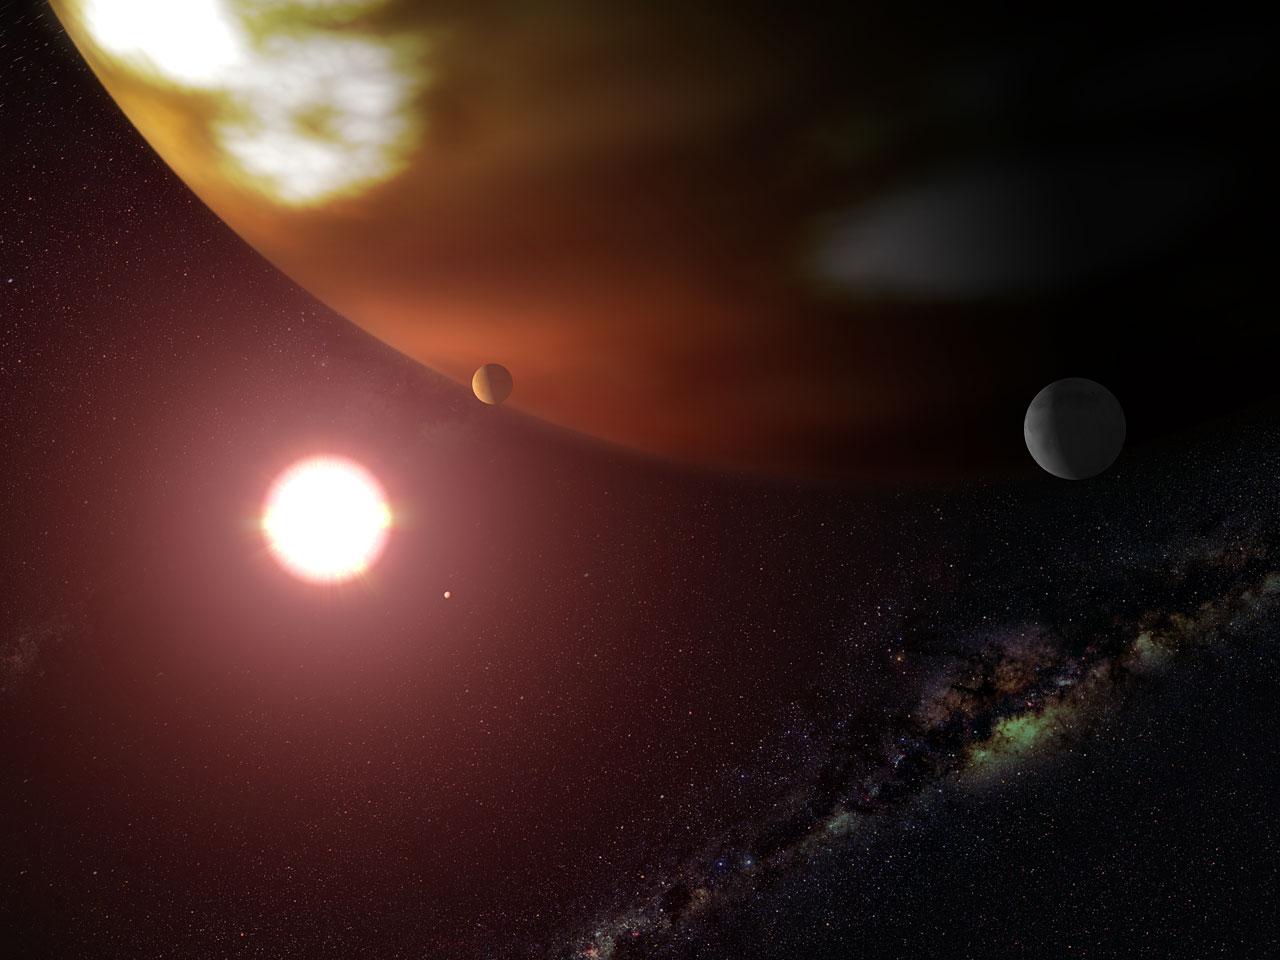 Hubble Makes Precise Measure of Extrasolar World's True Mass (artist's impression)